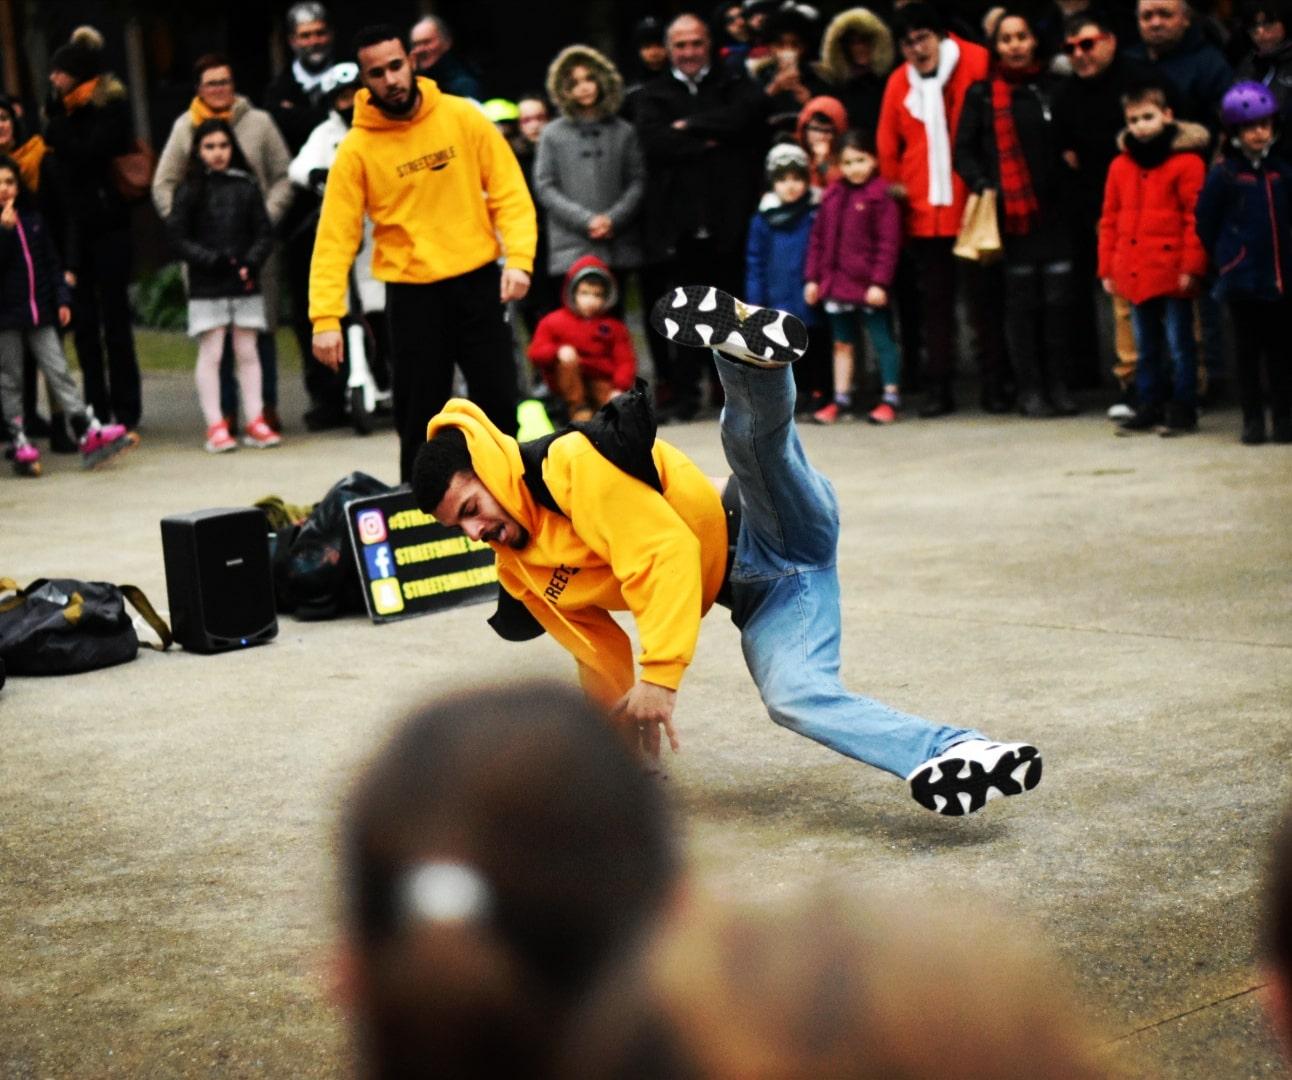 Prestation breakdance danseur professionnel - Streetsmile